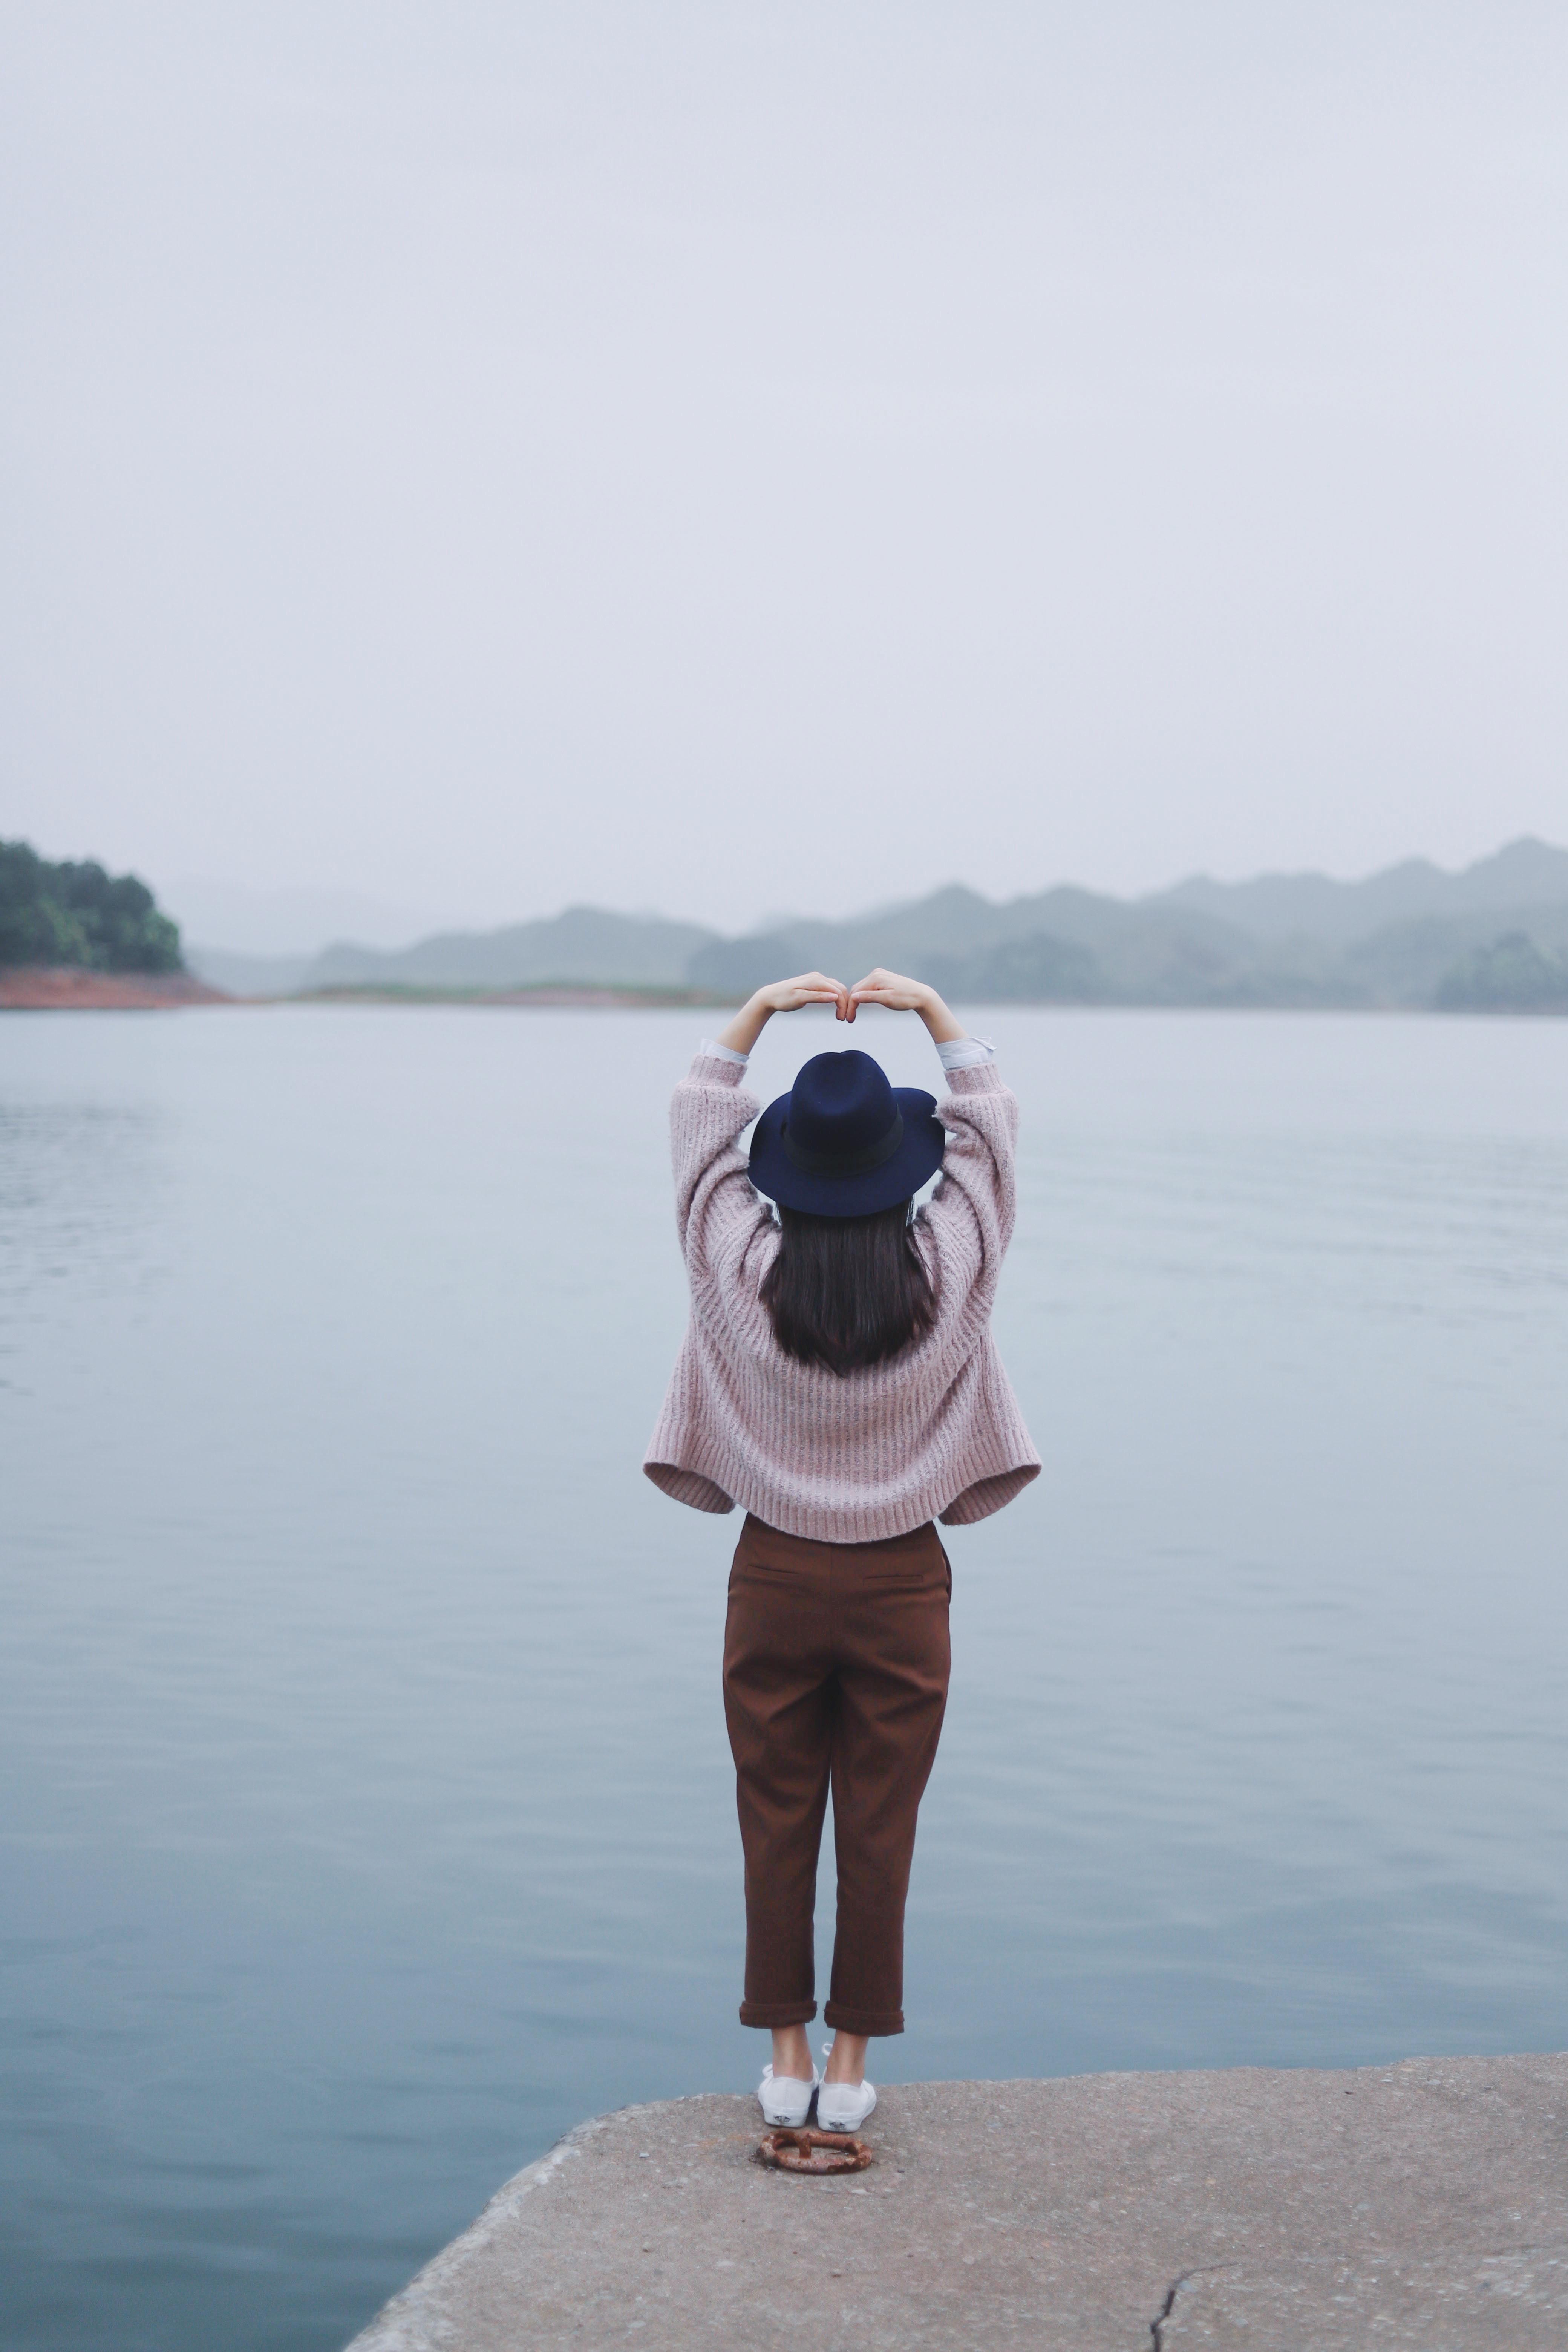 woman taking a heart pose beside body of water